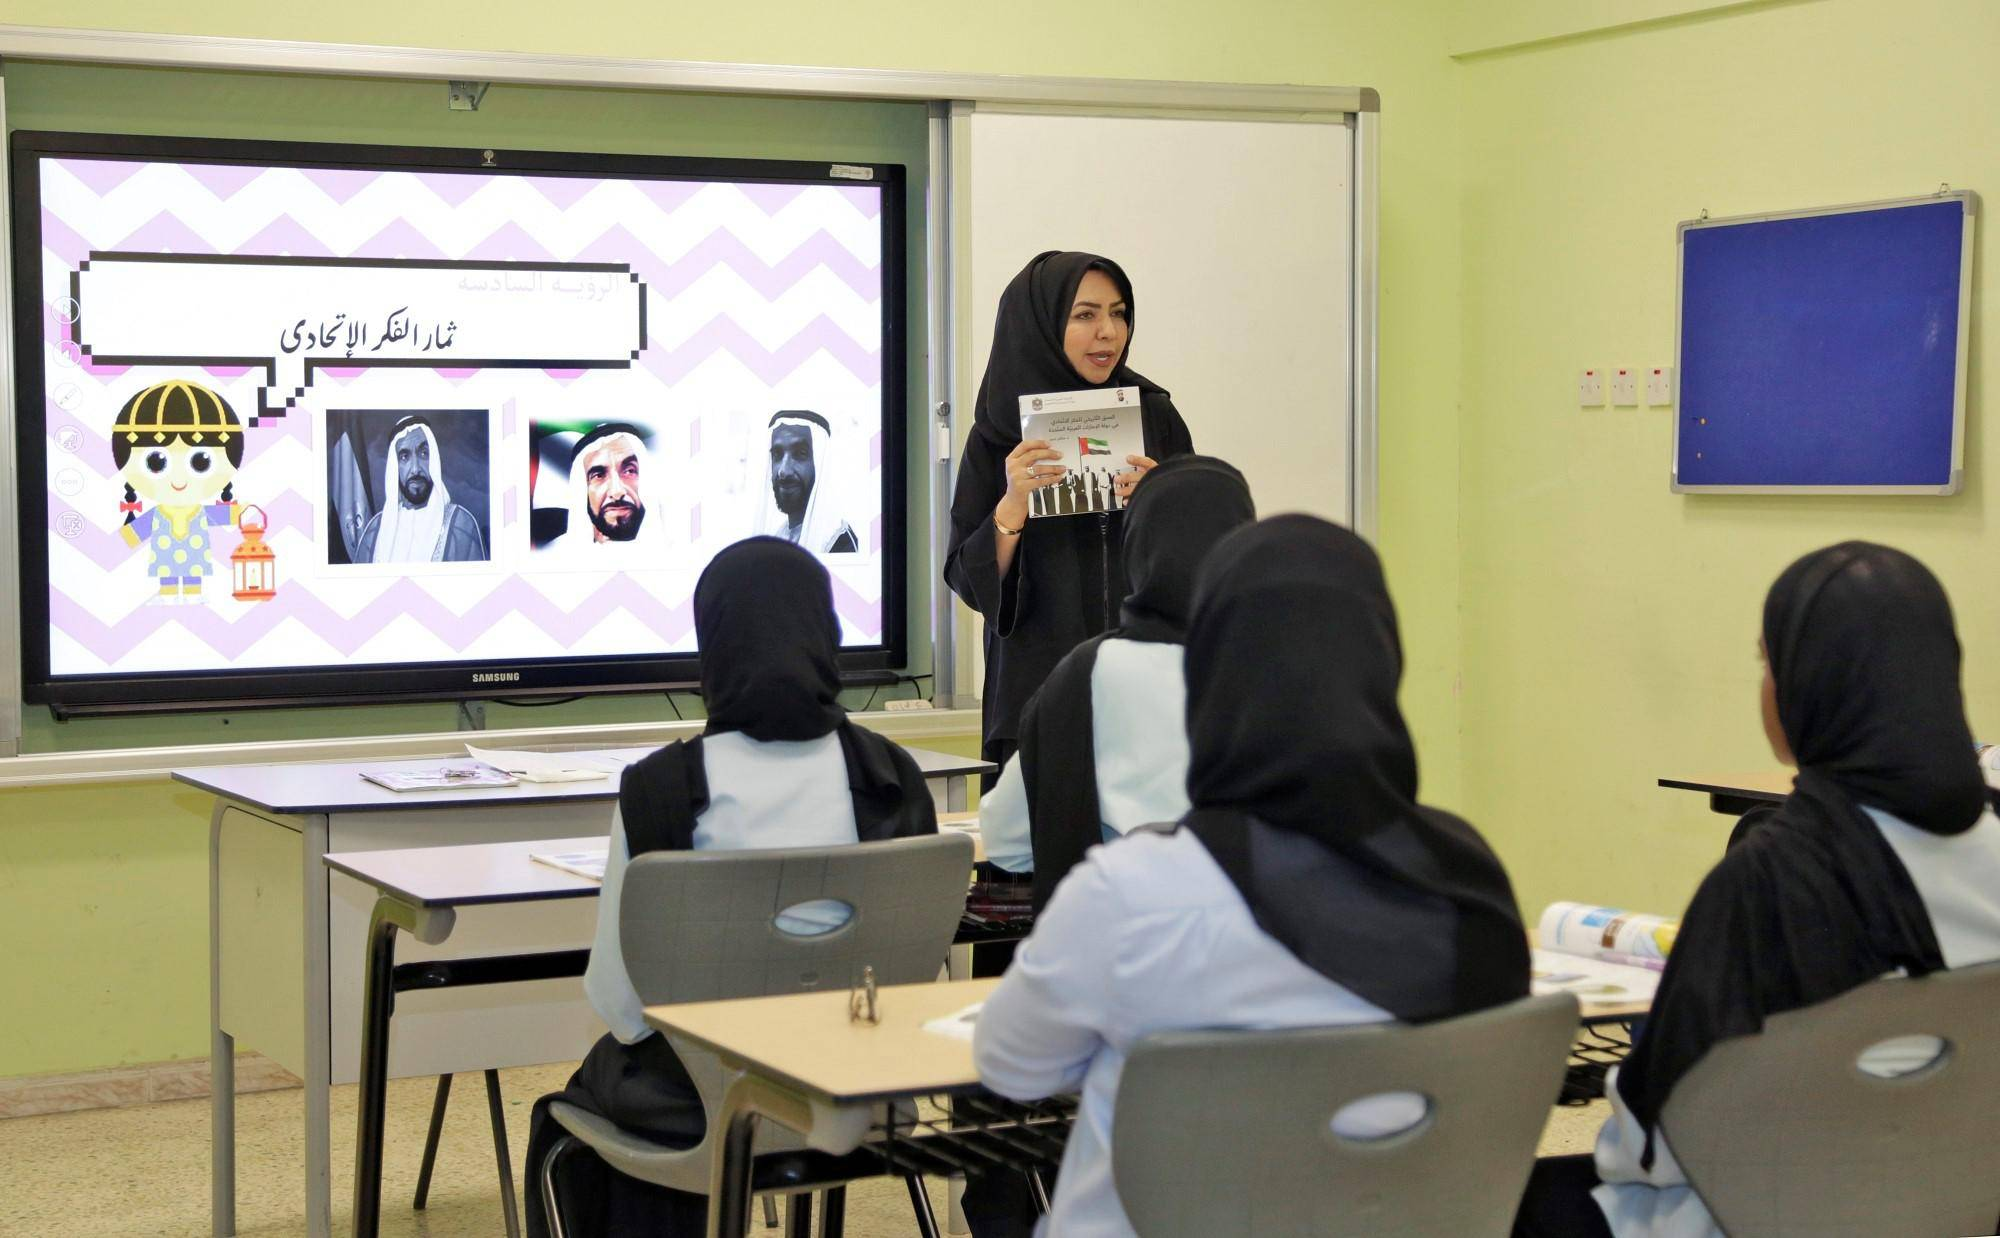 UAE citizenship: Education sector hails new law as futuristic